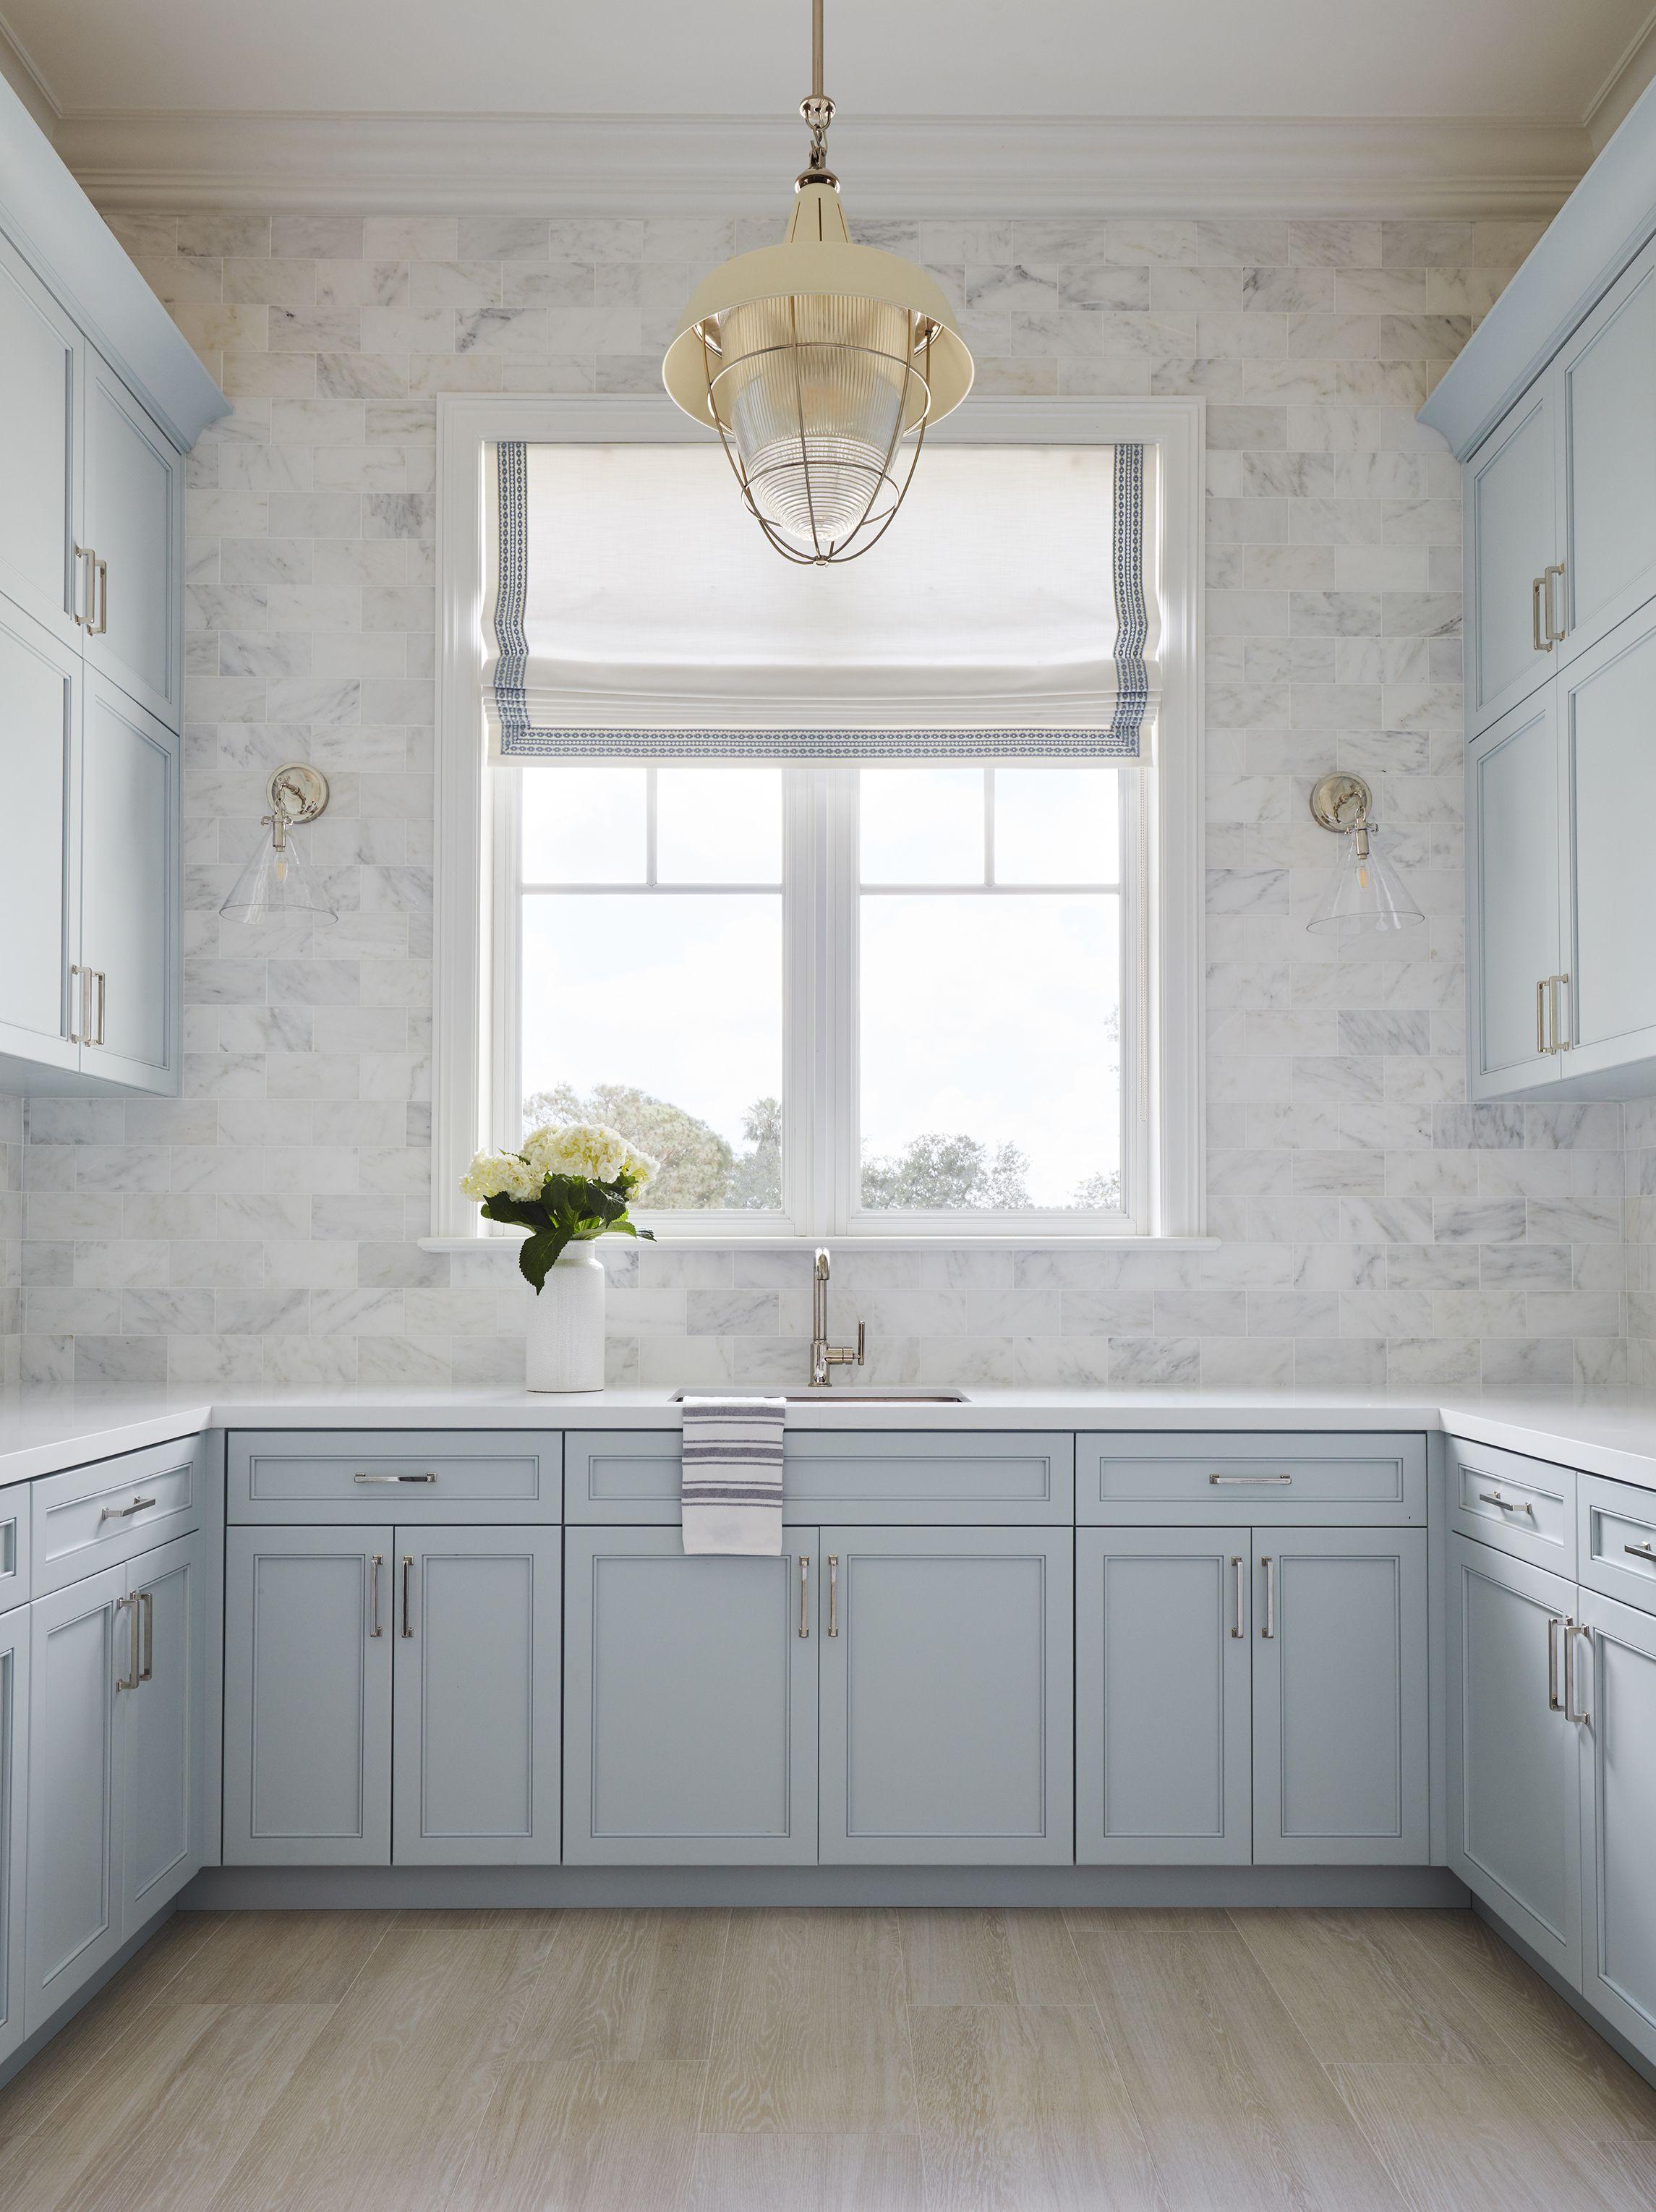 Laundry Resized 20mb Jpg Light Blue Kitchens Blue Kitchen Cabinets Kitchen Remodel